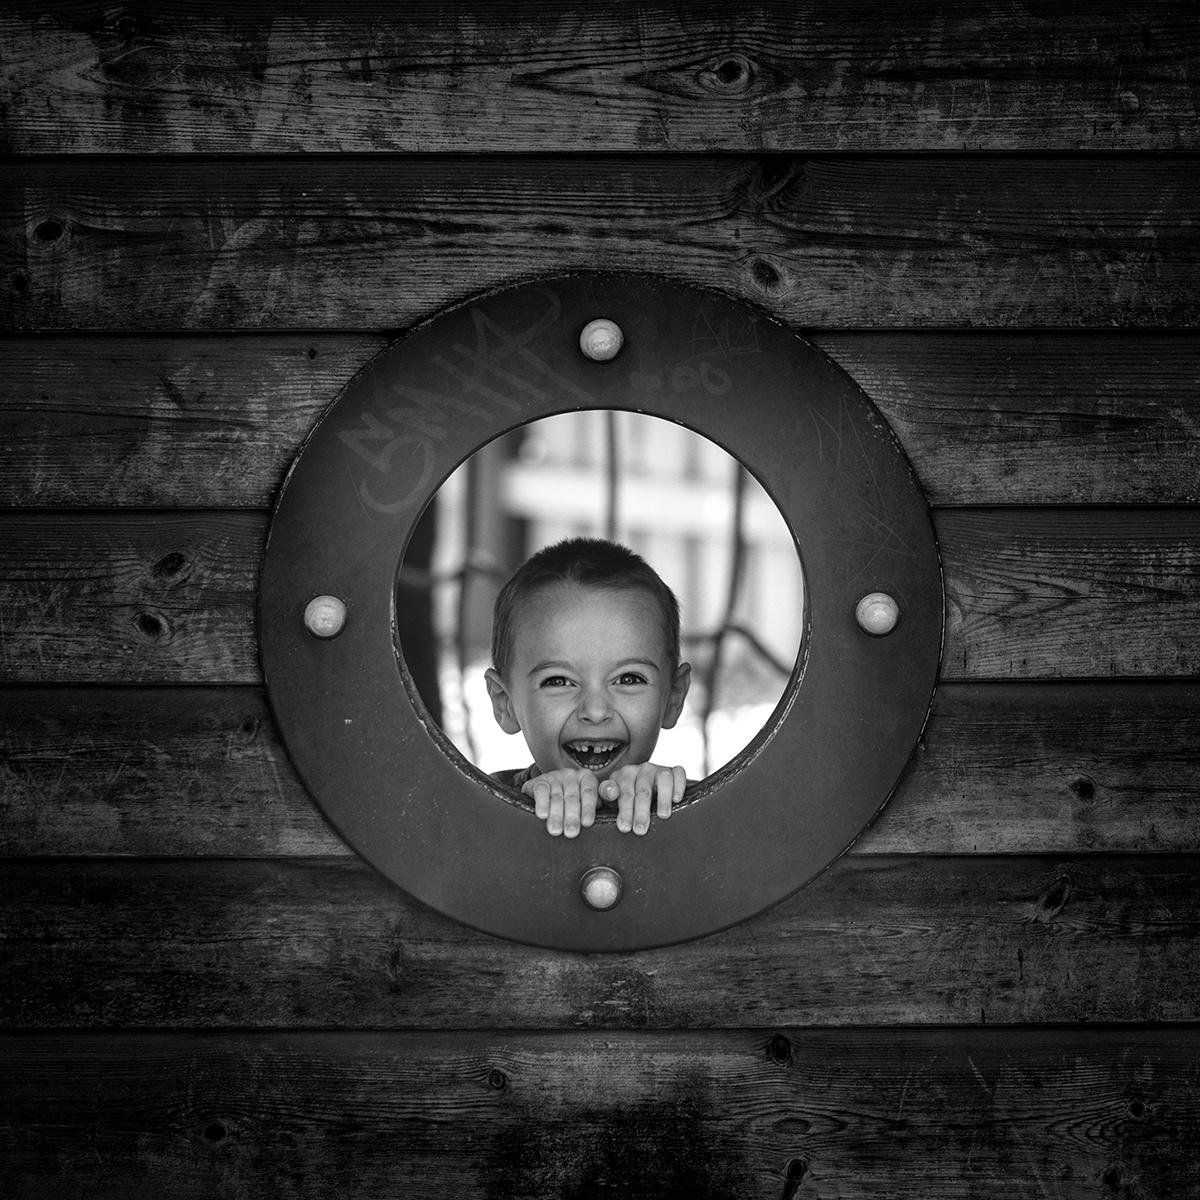 Black and White Cheeky Boy Portrait